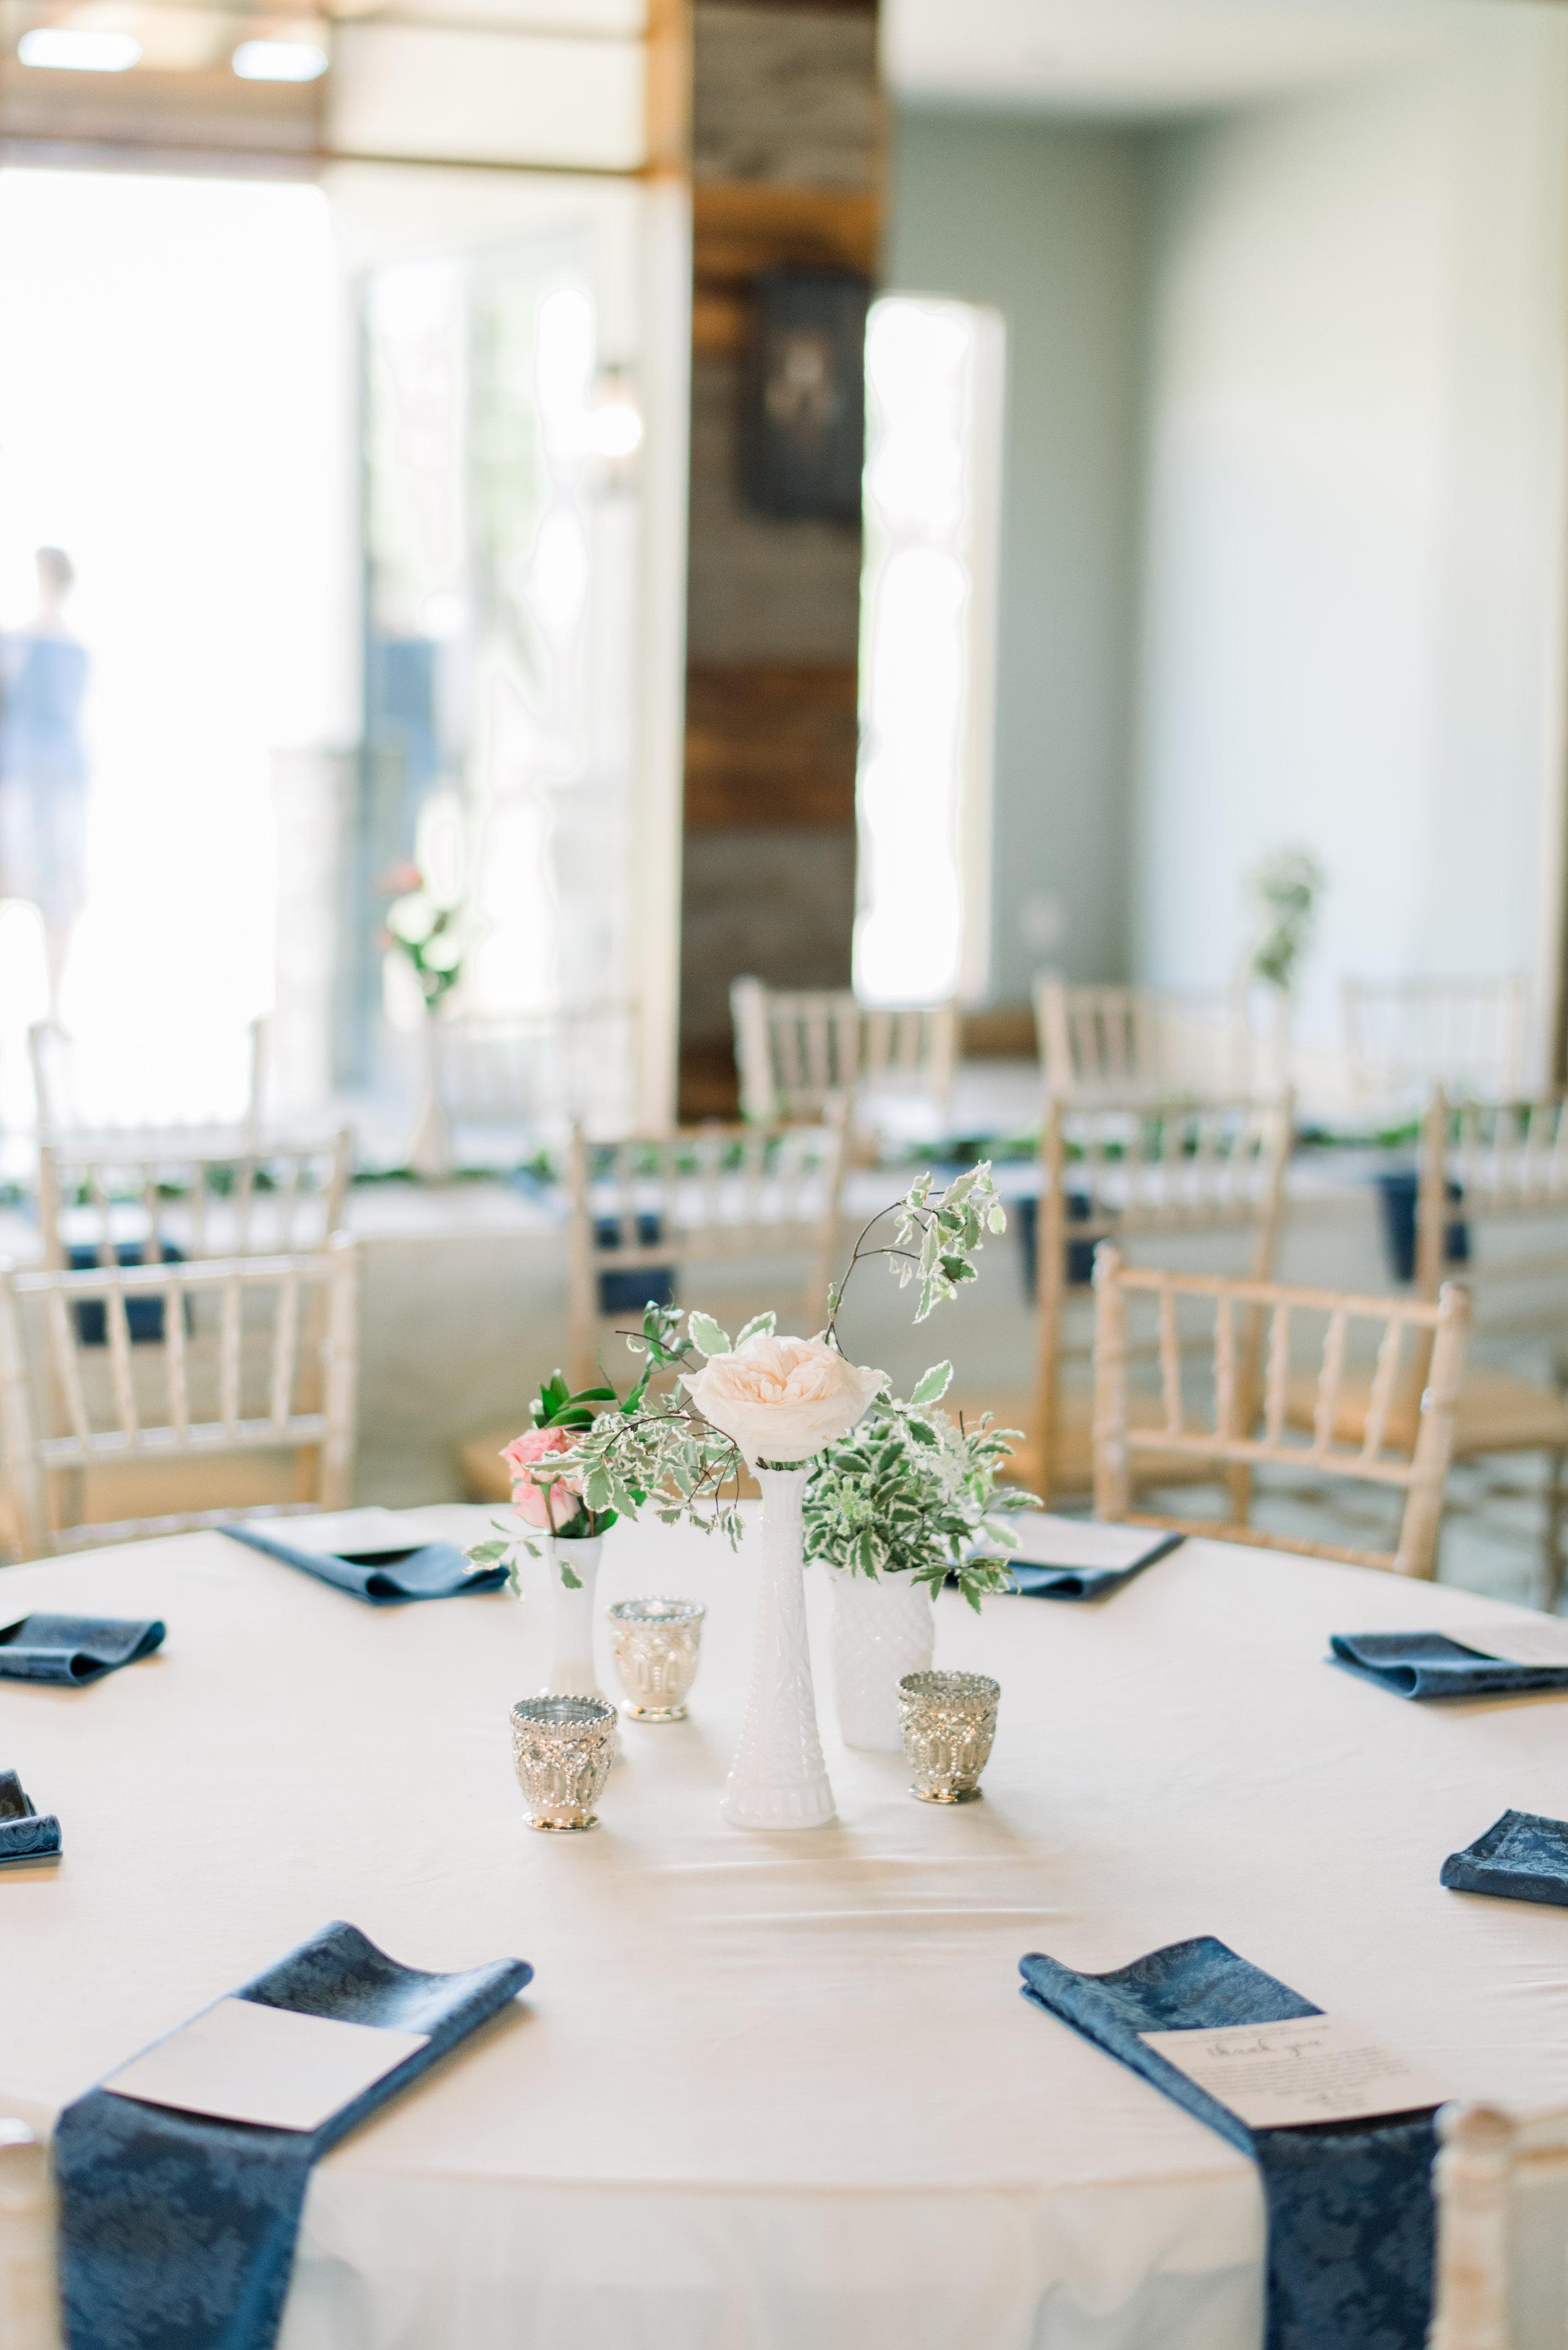 milk glass bud vase centerpiece romantic simple blush inspiration epoch co wedding planner coordinator texas college station